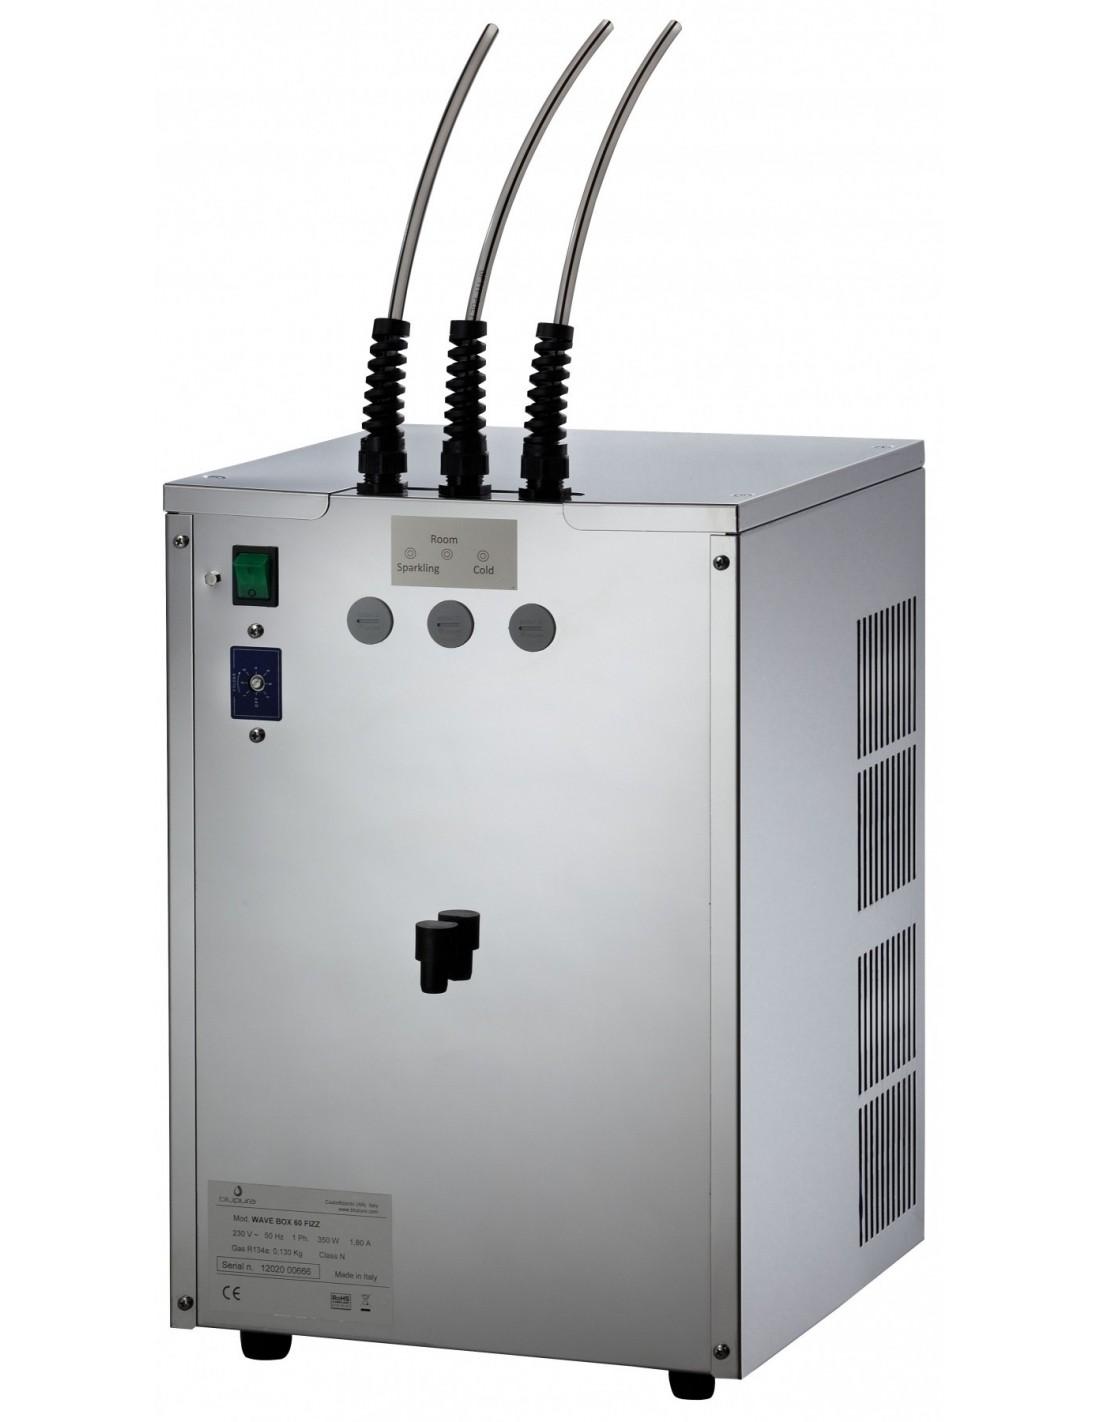 UPP00100 - Kolsyrat vatten - Blupura Bluesoda Box Fizz 60